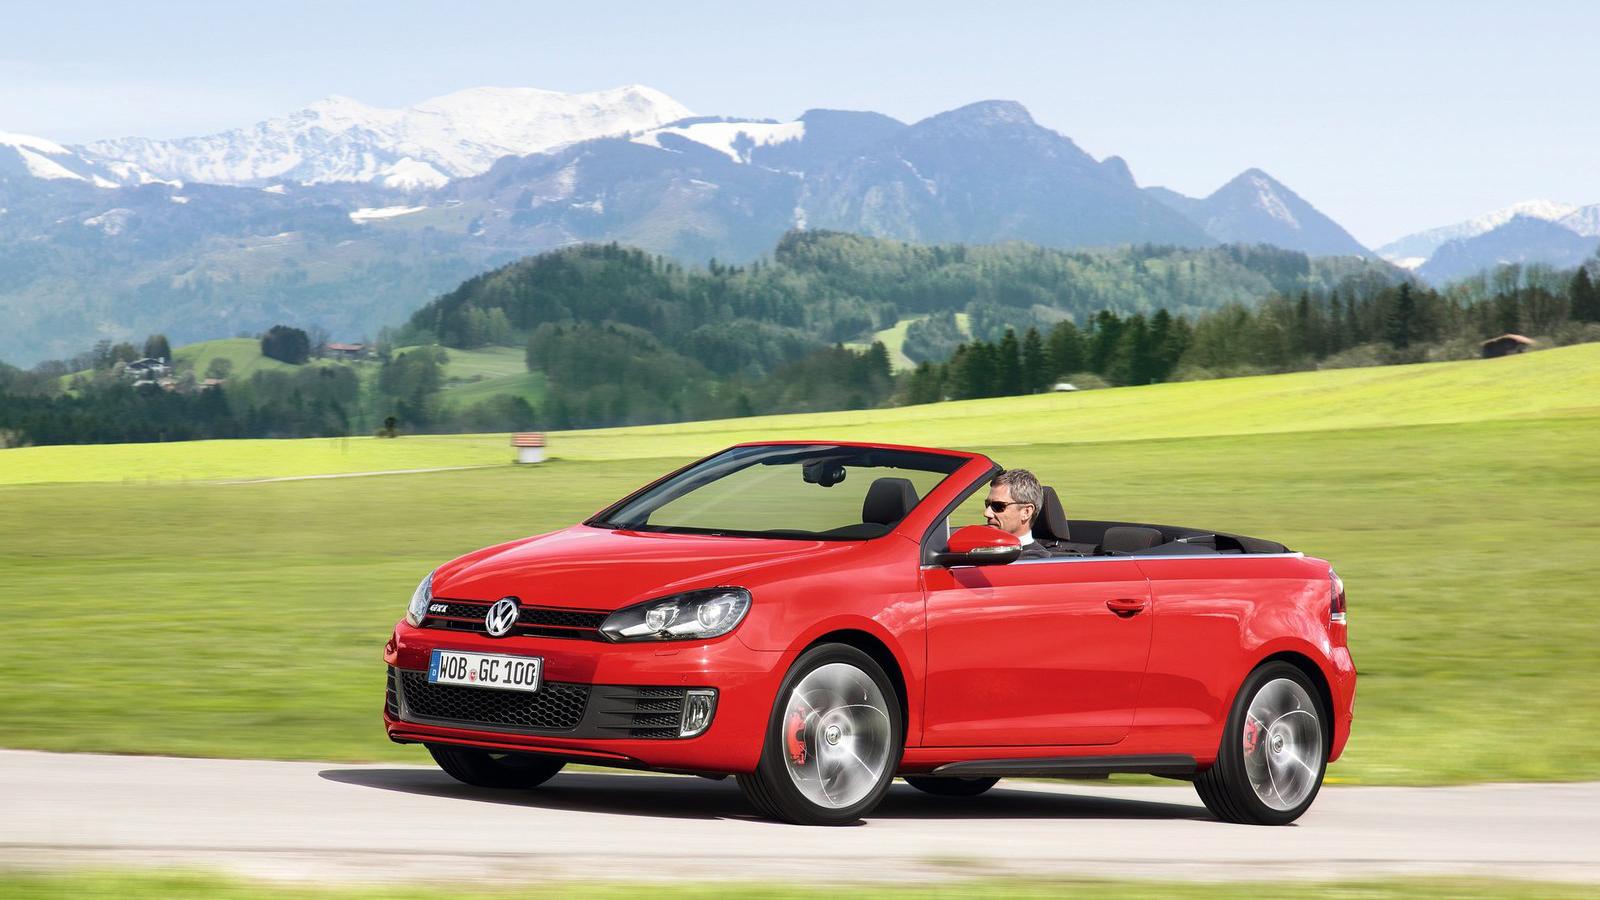 car wallpapers free download 2013 volkswagen golf gti cabriolet 2 0 turbo 207 hp 147 mph 0 62. Black Bedroom Furniture Sets. Home Design Ideas